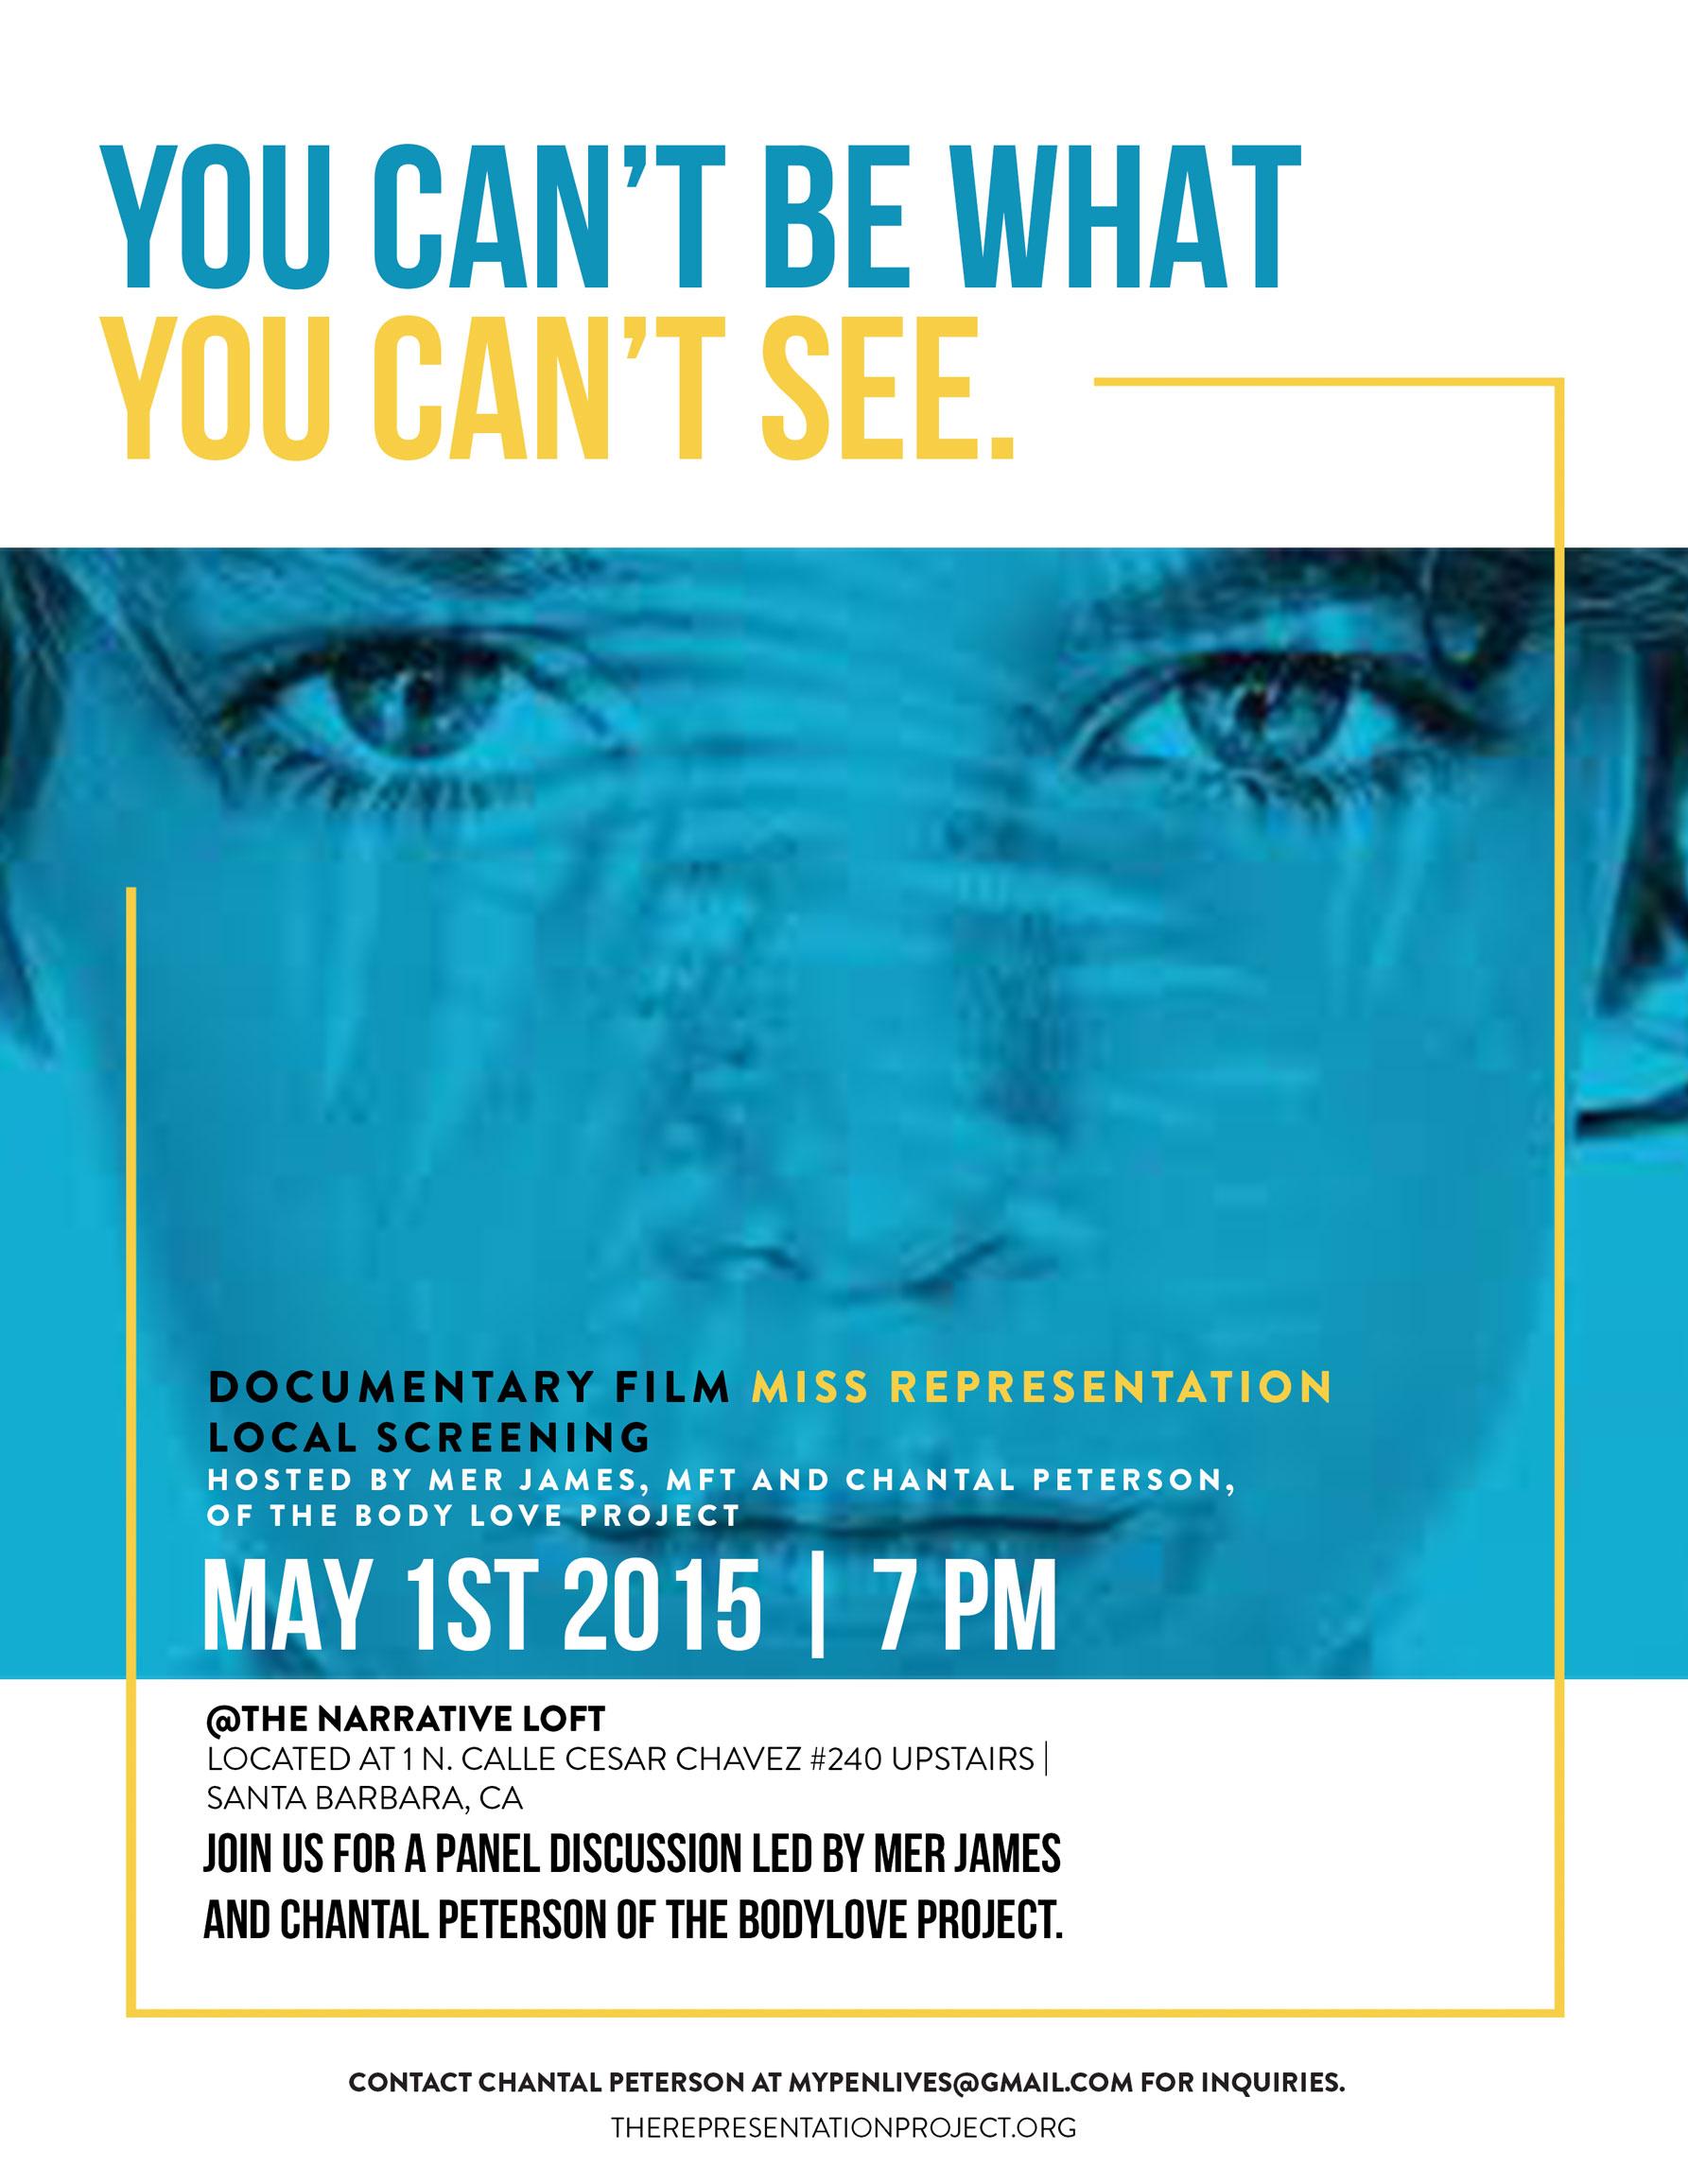 Flyer for the Santa Barbara screening of Miss Representation